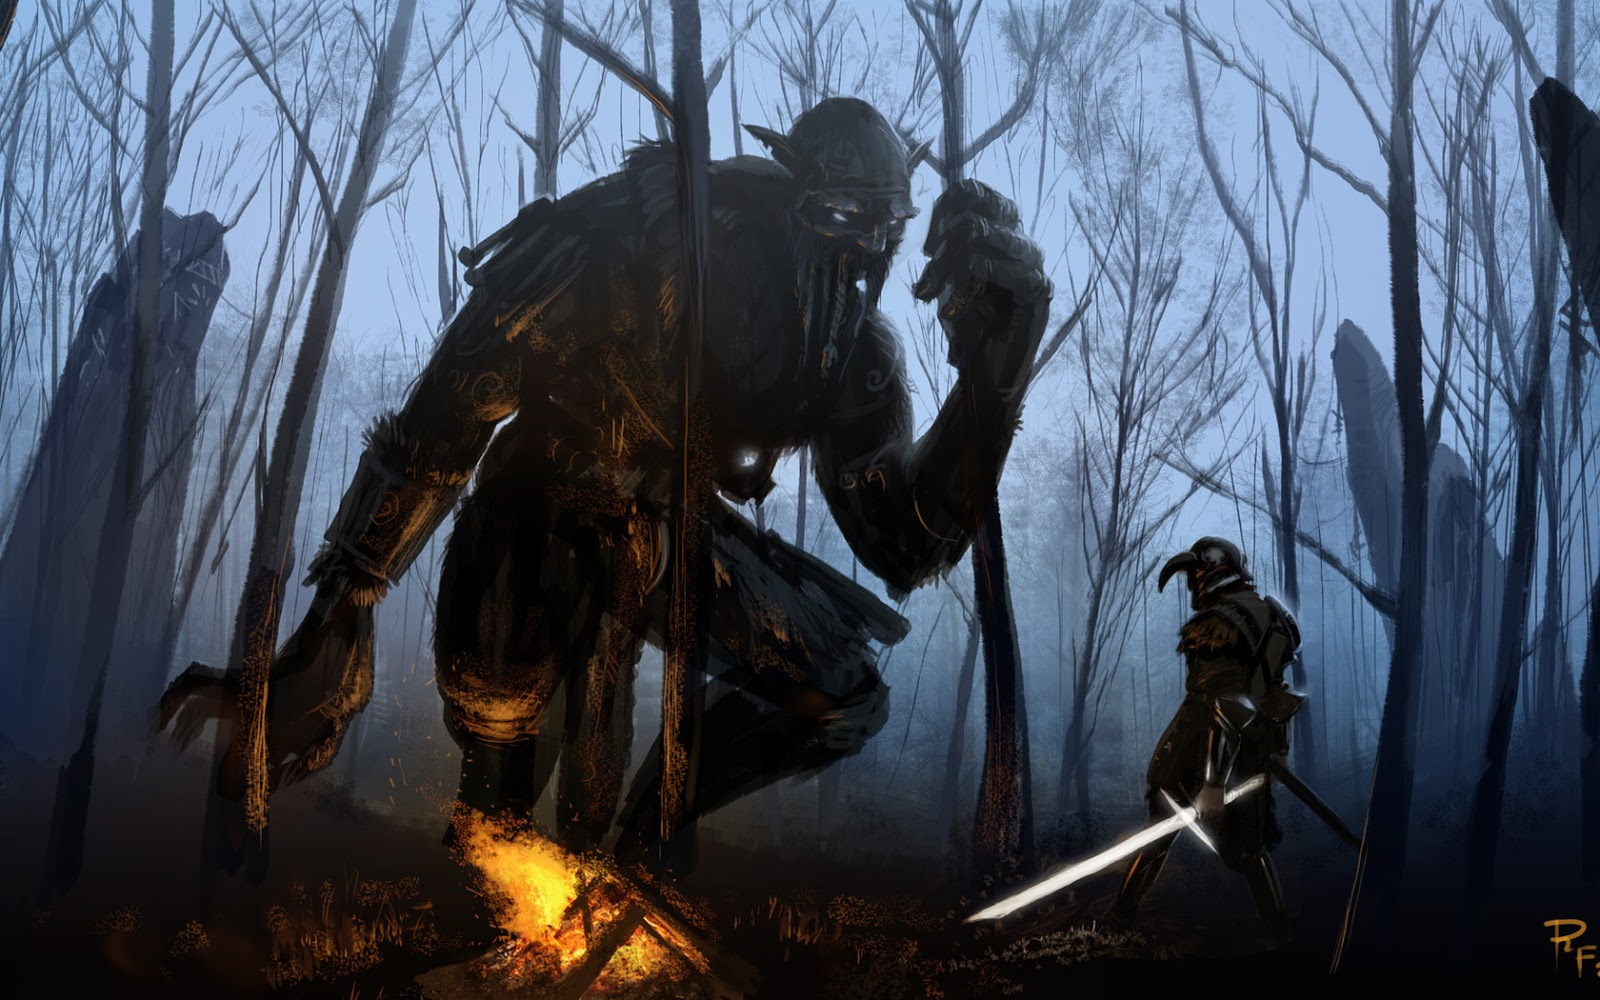 Giant Hero War Hd Fantasy Wallpaper